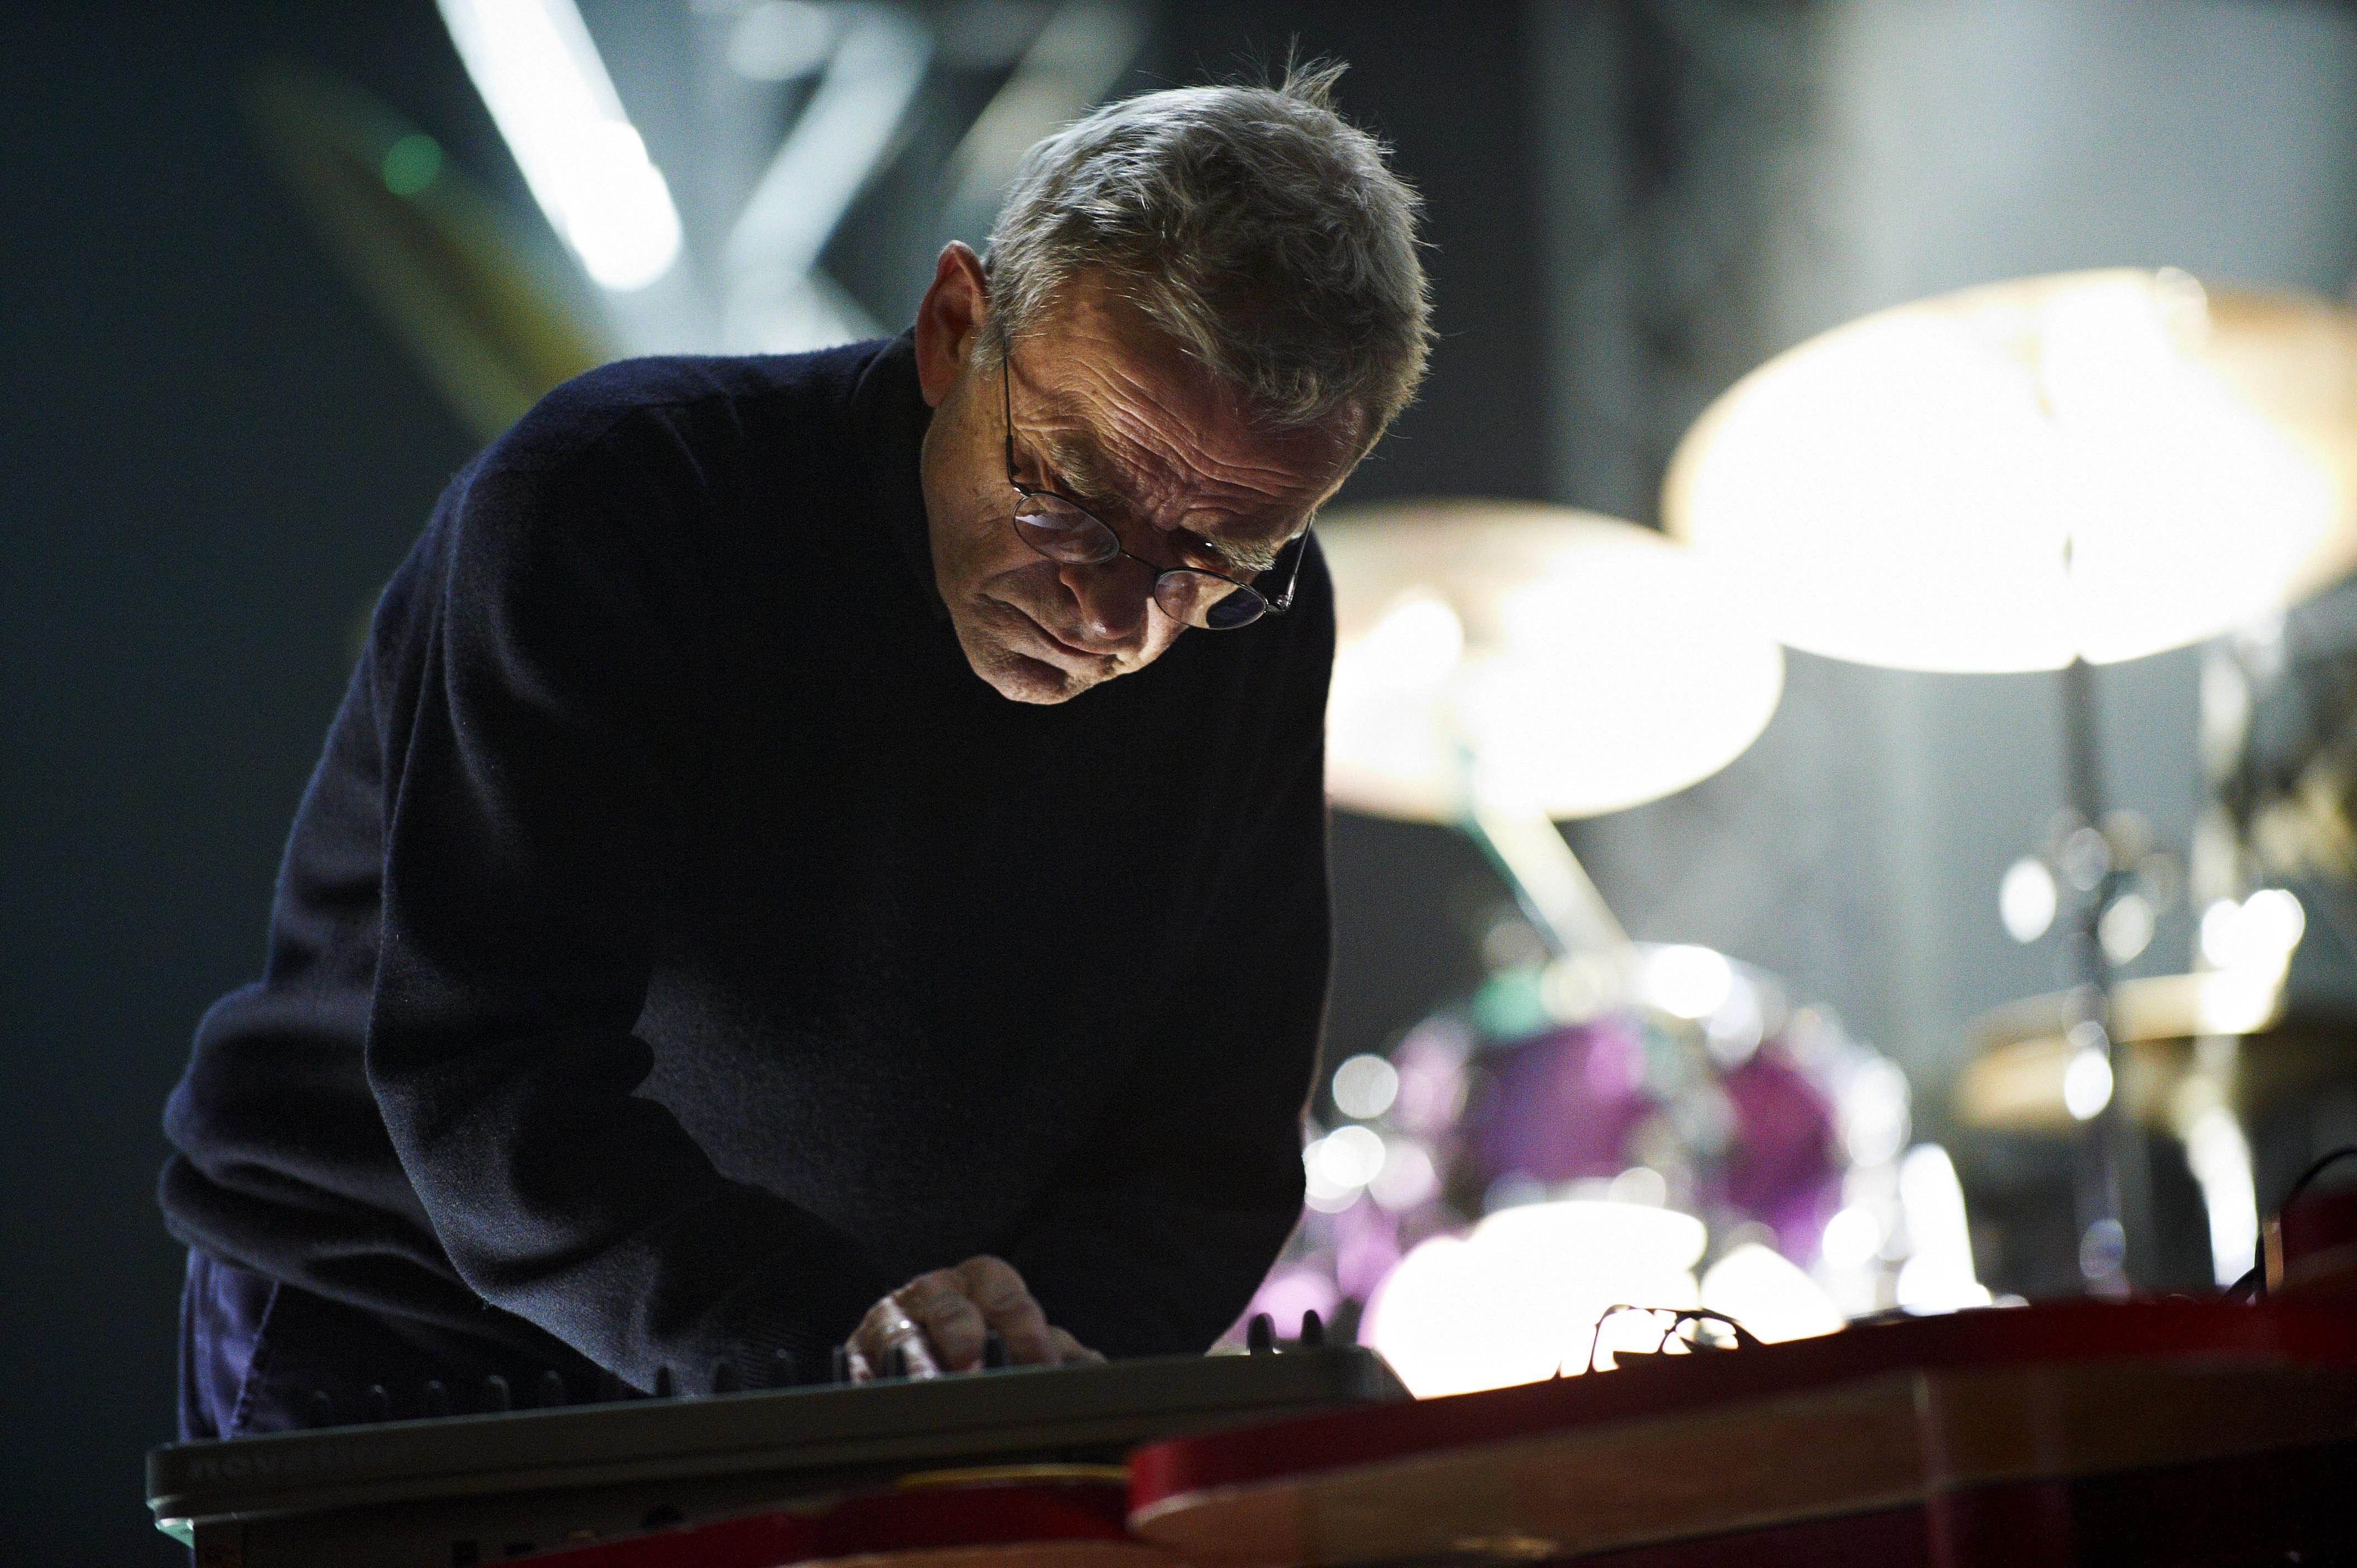 Dieter Moebius, Electronic Music Pioneer, Dead at 71